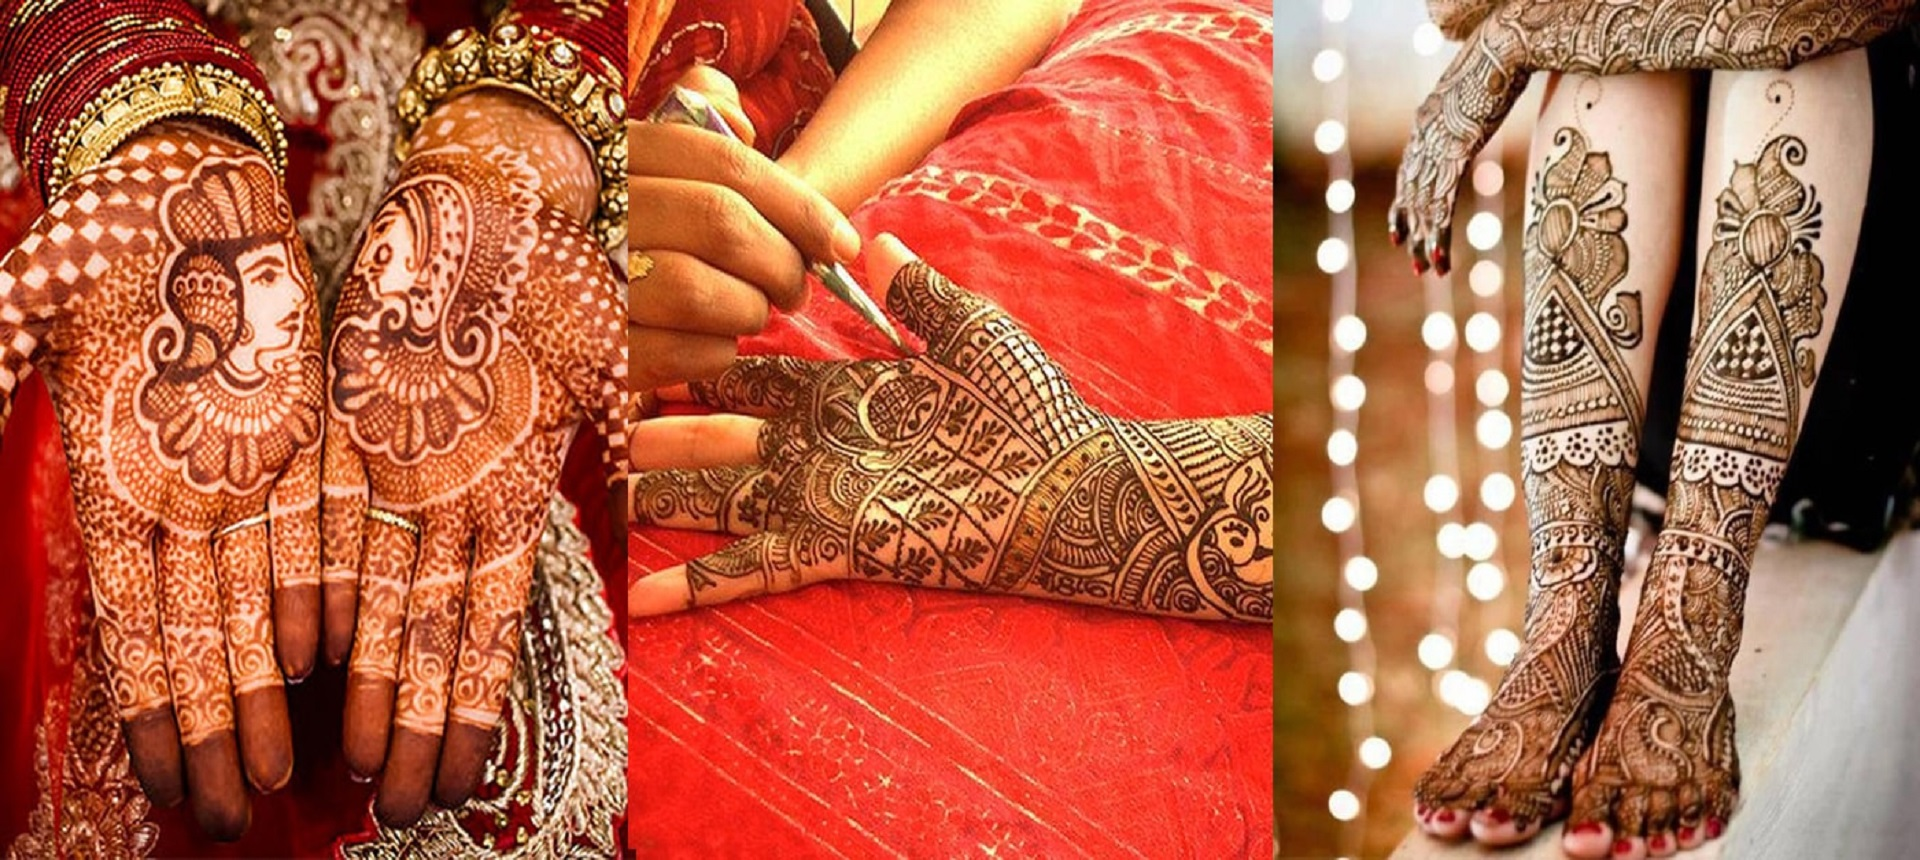 Meaningful Bridal Mehndi Design 8